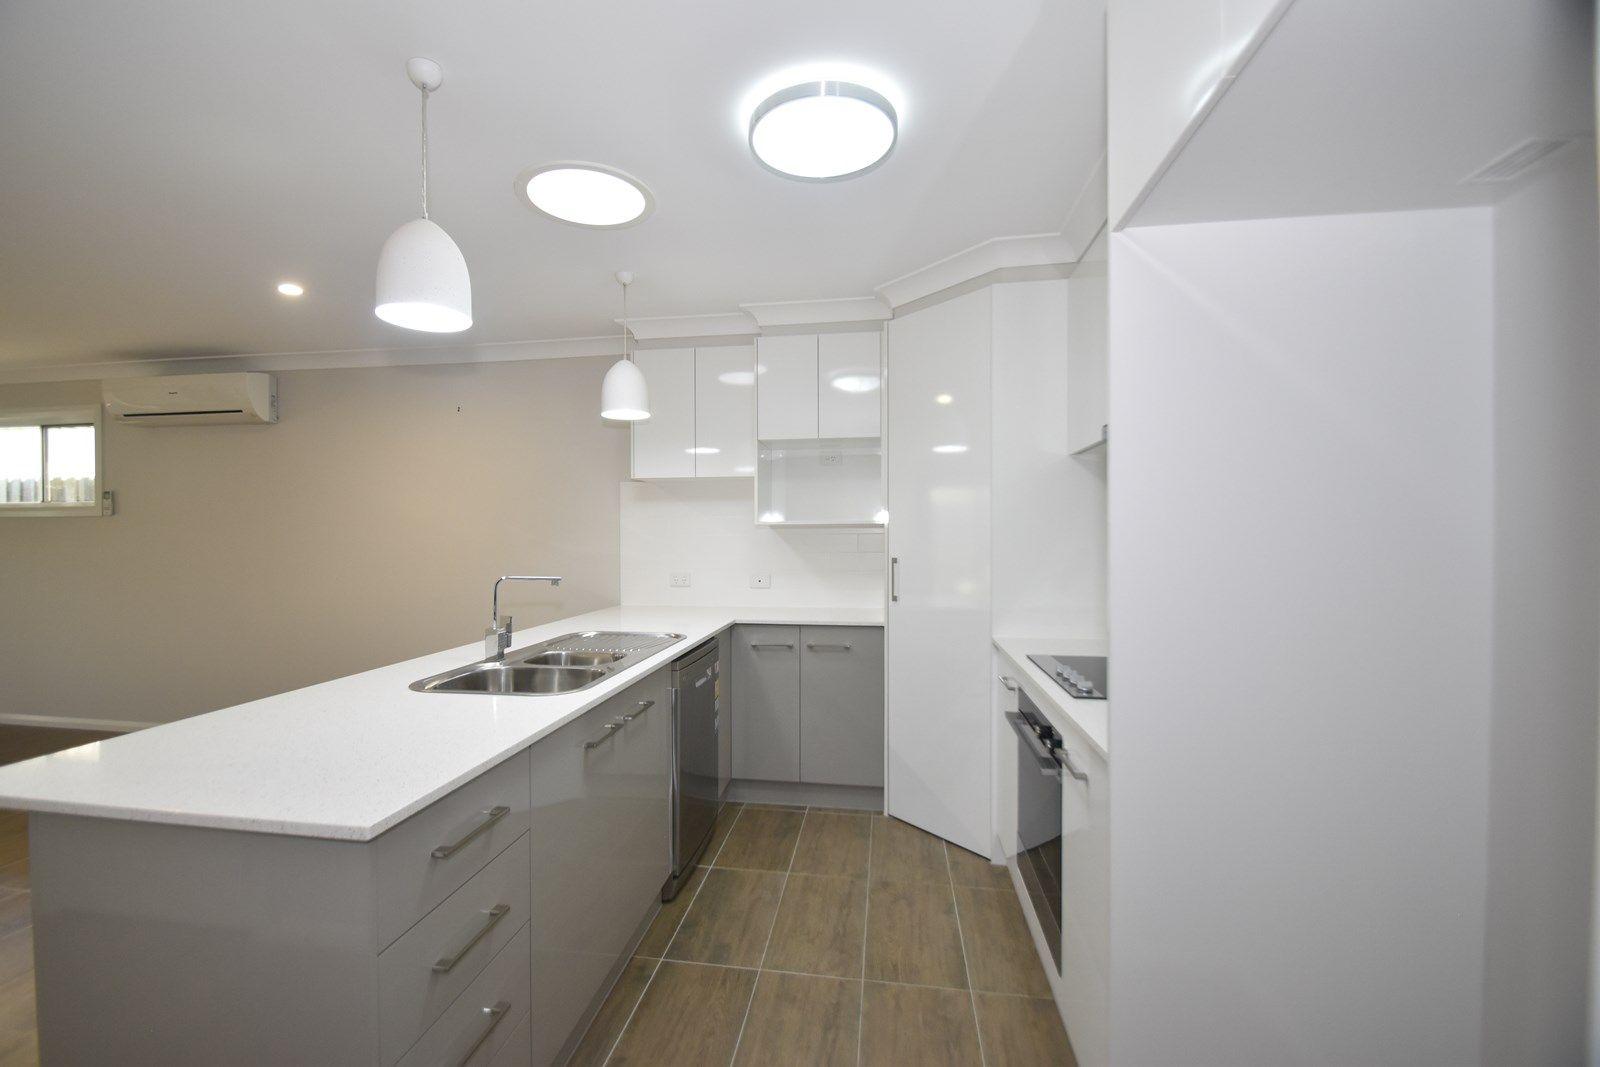 2/20 Camborne Street, Kleinton QLD 4352, Image 2